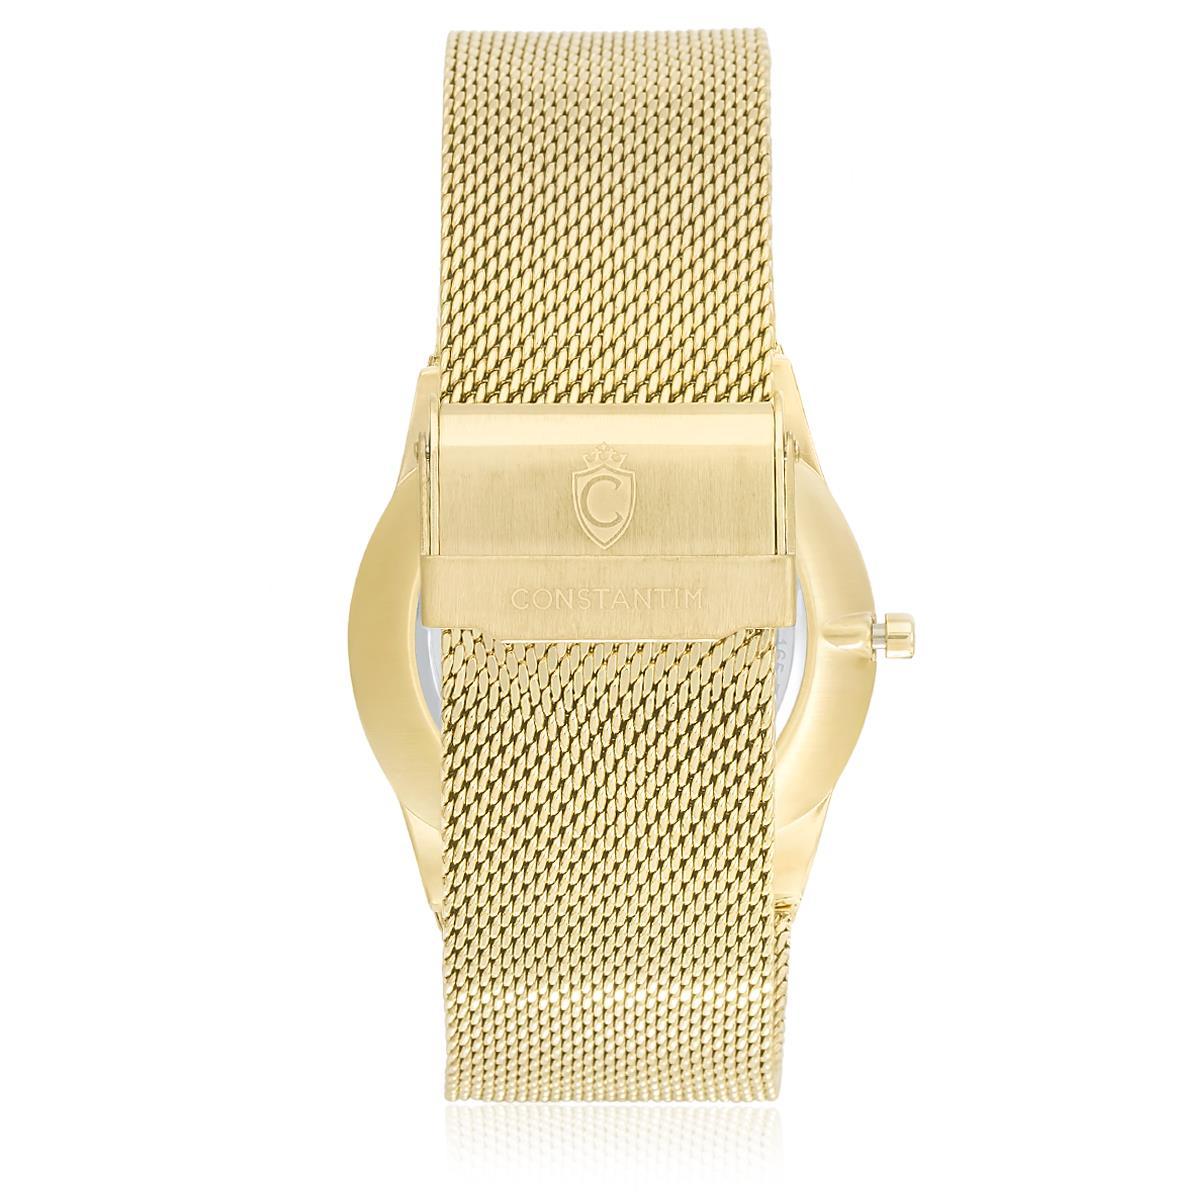 bca61faf329 Relógio Masculino Constantim Odense ZW20010G Gold